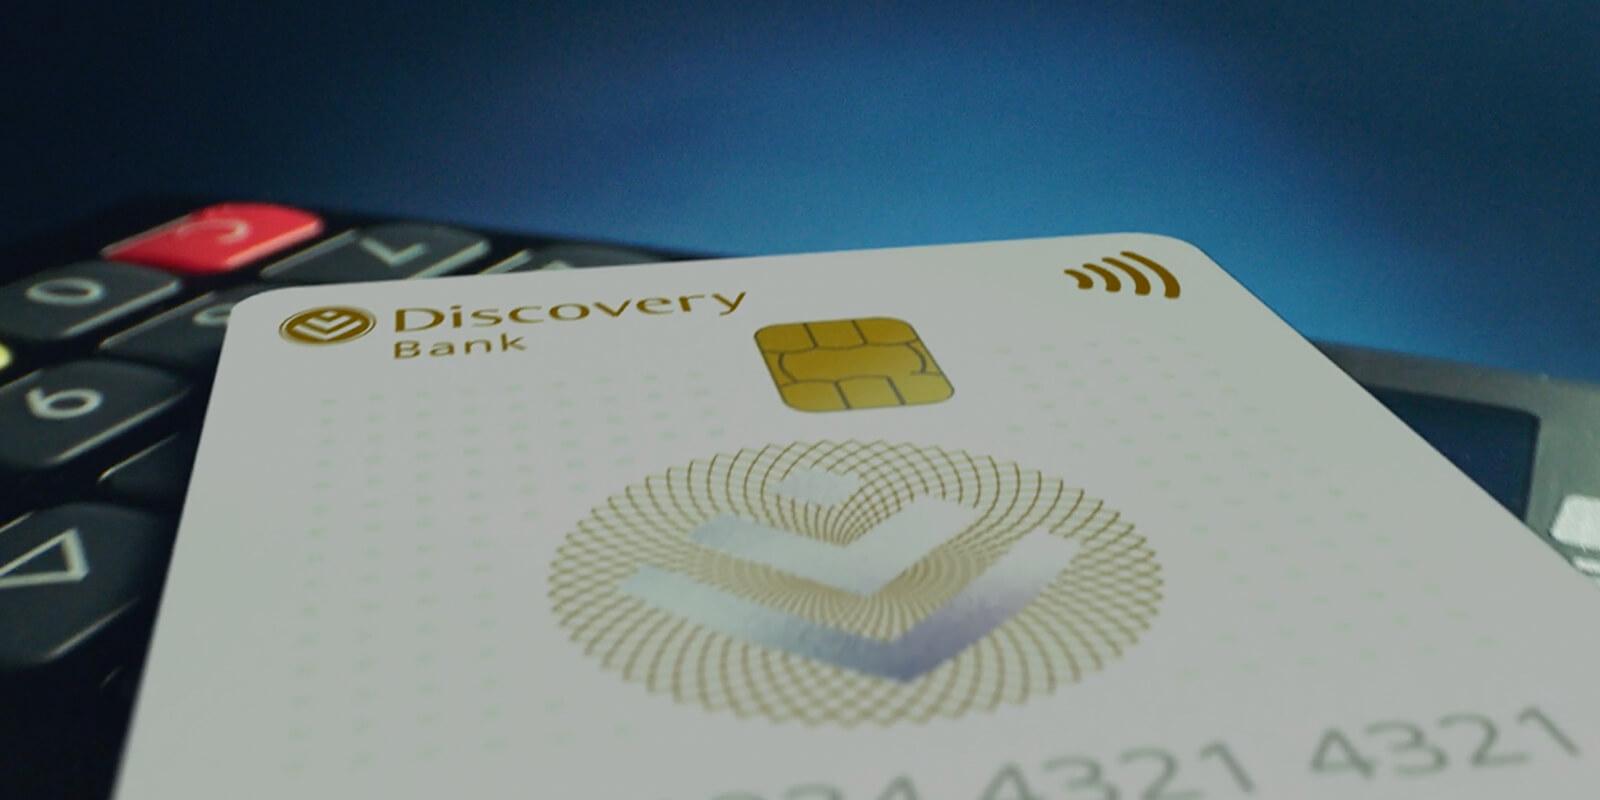 Metropolitan Republic Discovery Bank Shared Value